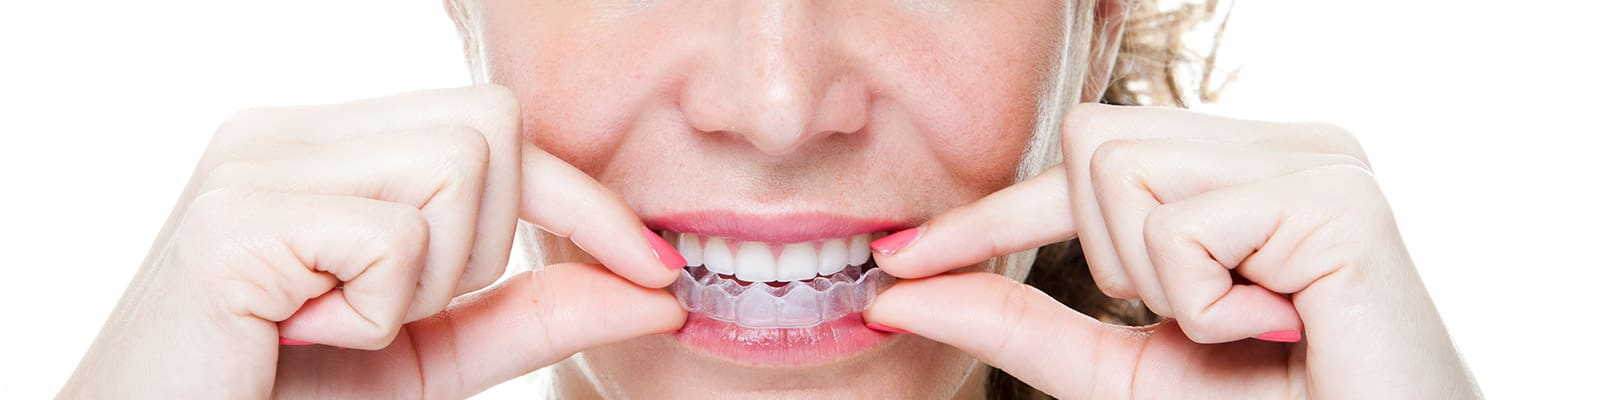 orthodontic services odyssey dental winnipeg dentist